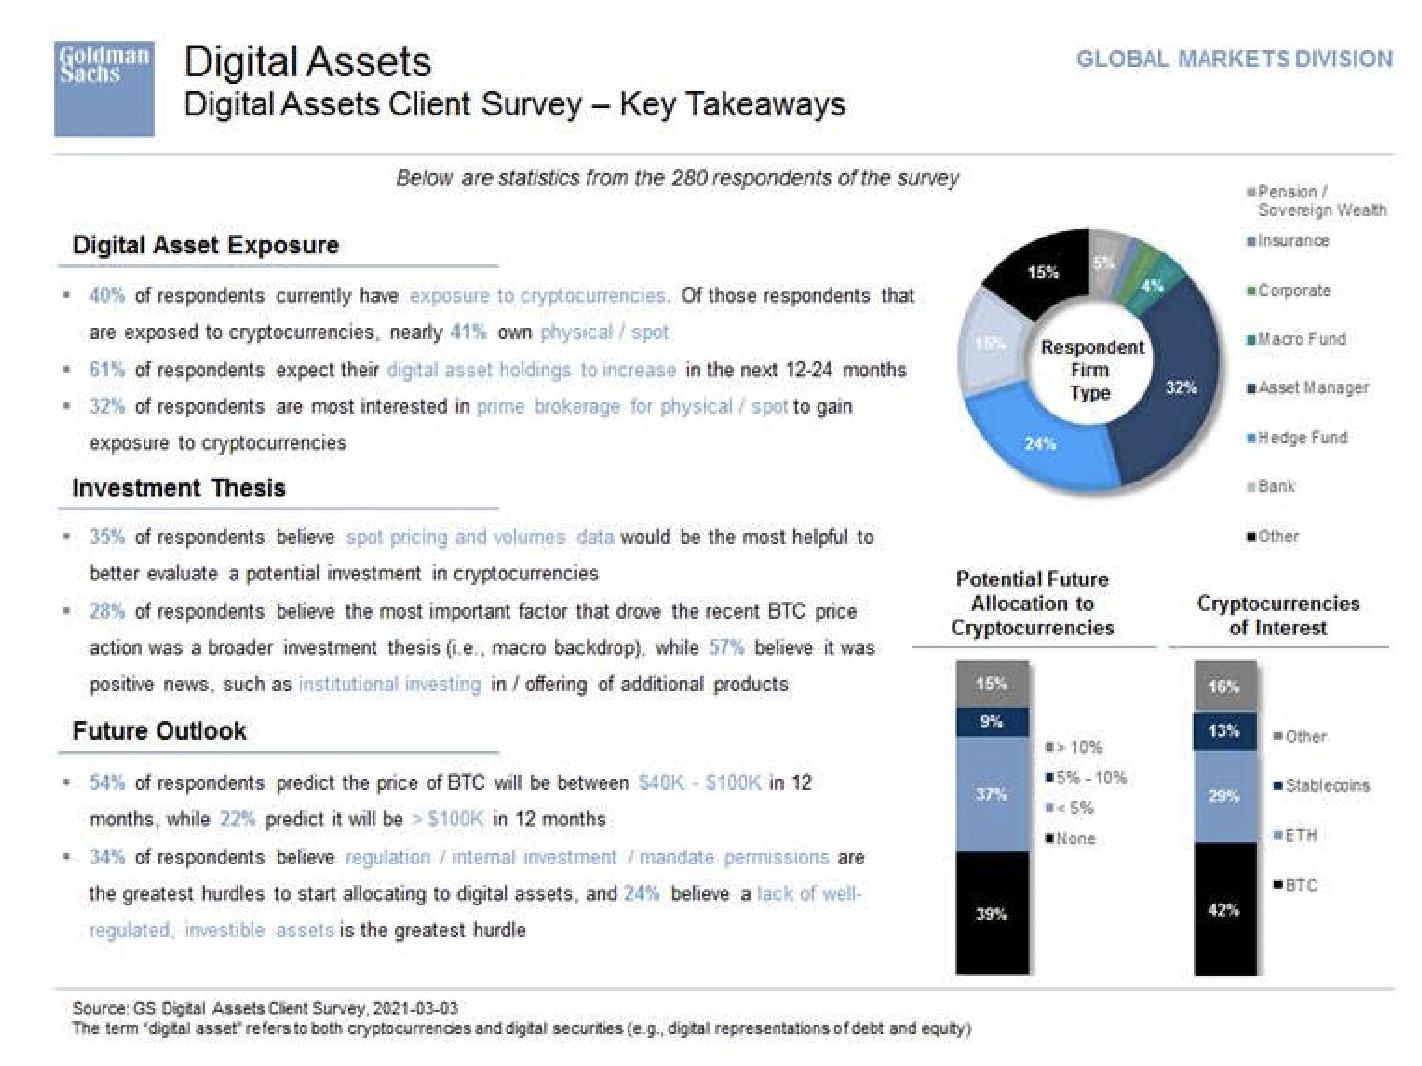 Goldman Sachs Digital Assets